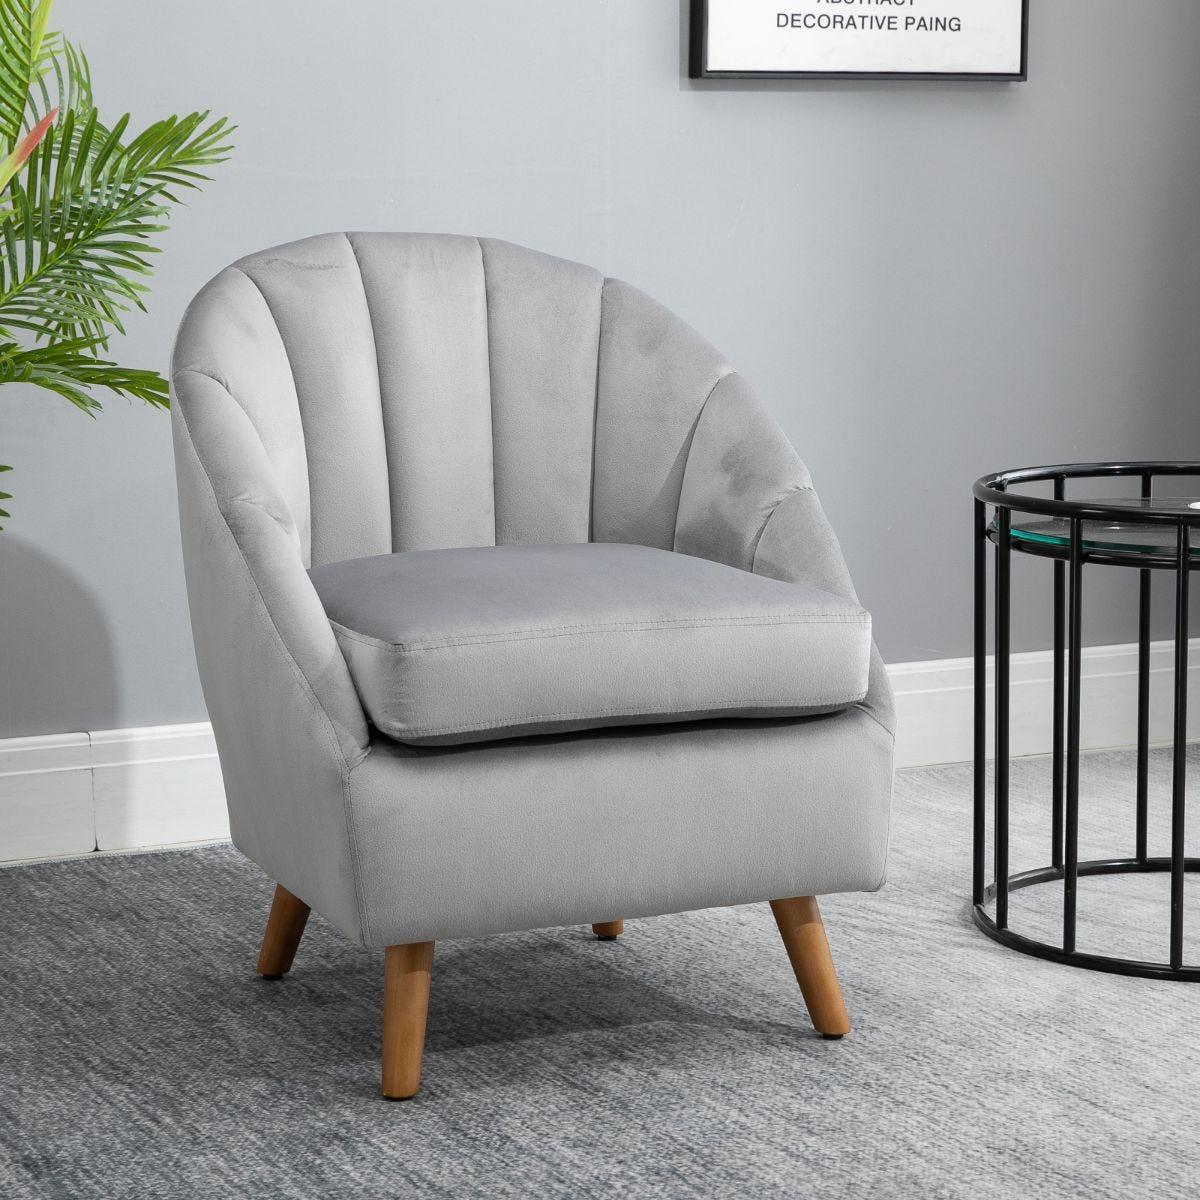 Shell Back Armchair Vintage Velvet Style Fabric Solid Wood Legs Light Grey